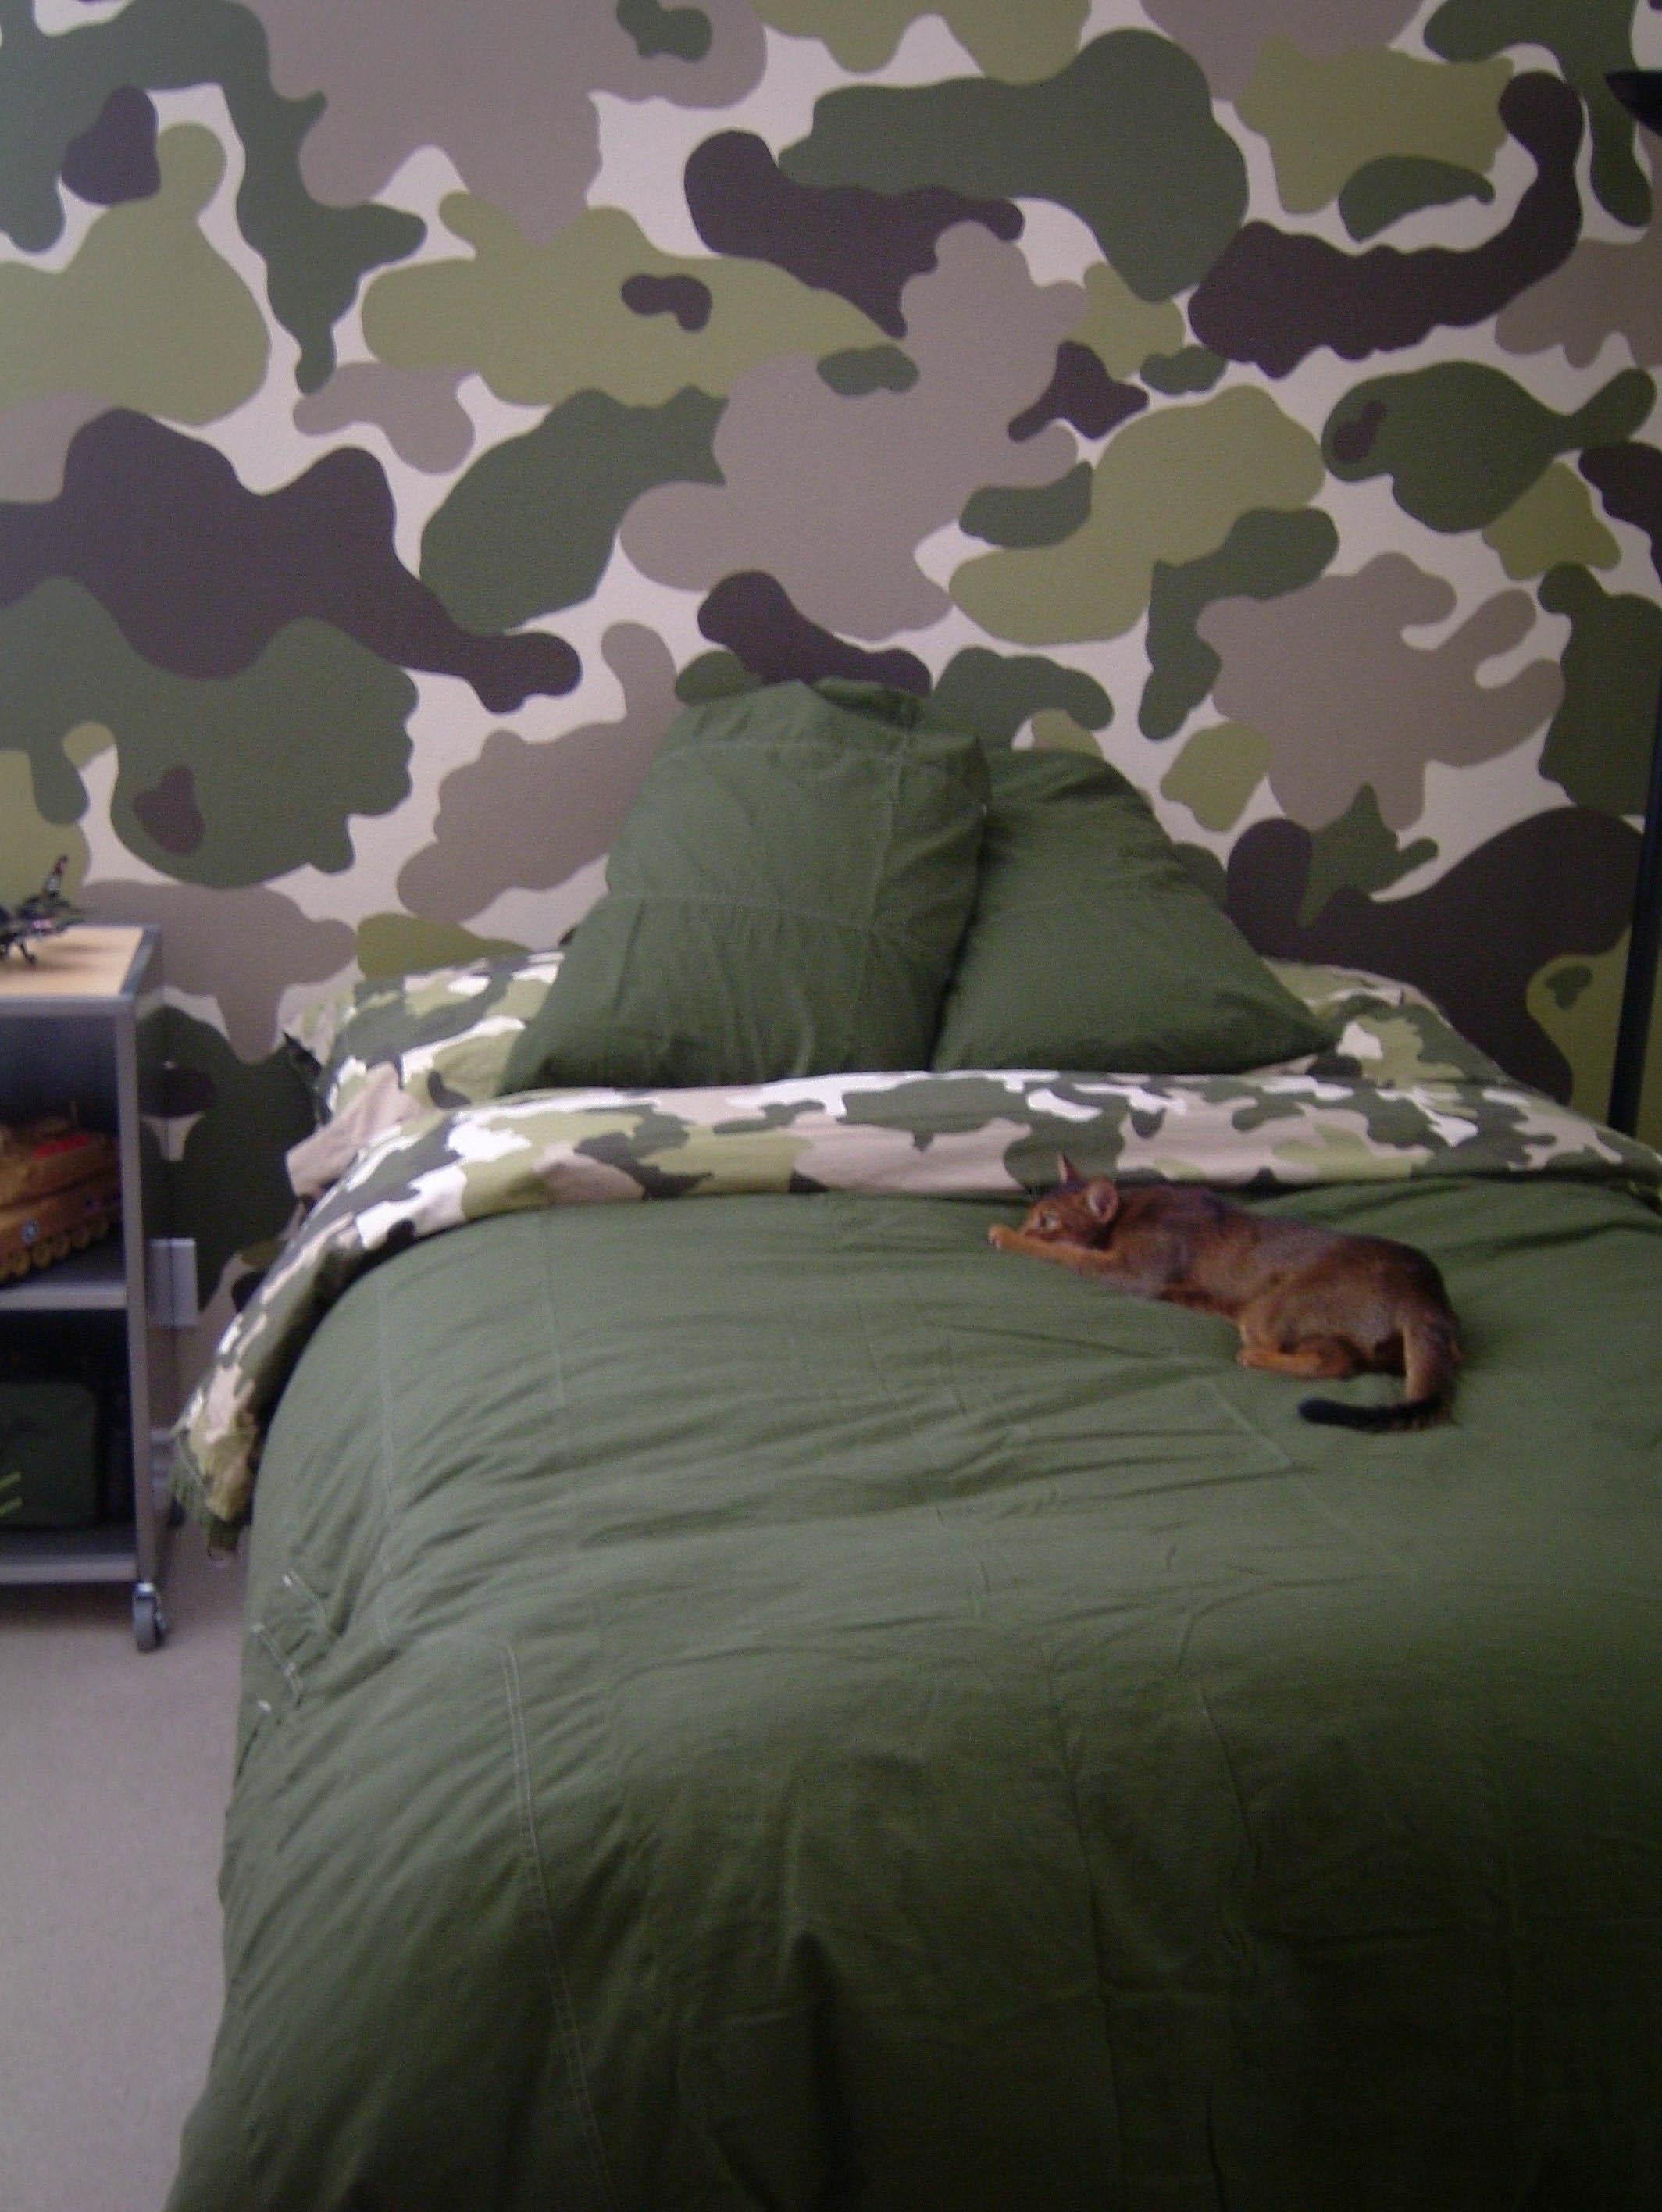 Room Swap Part 1 – The Modchik Regarding Camouflage Wall Art (Image 19 of 20)